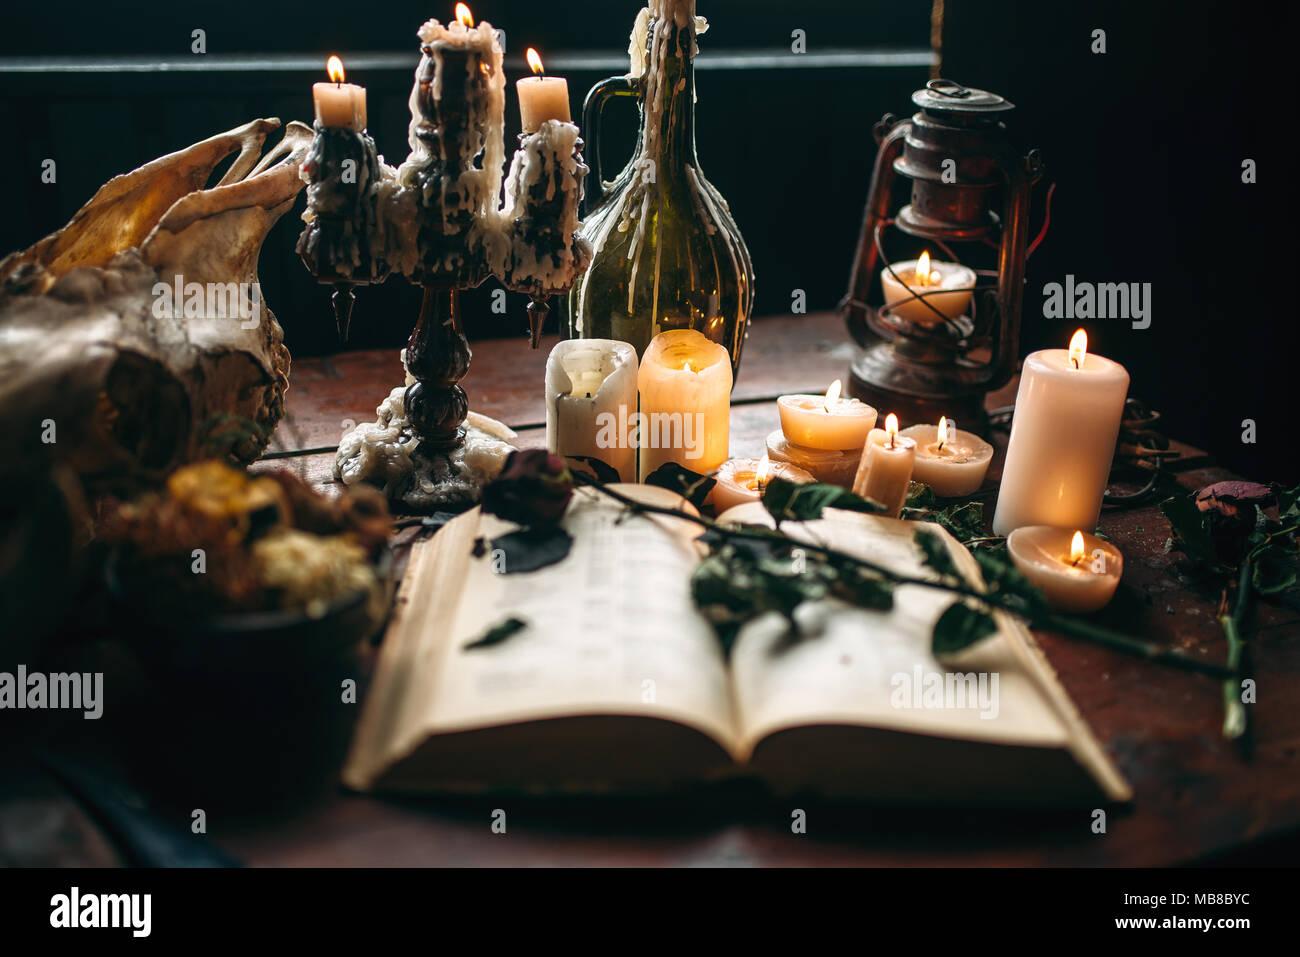 Ritual Magic Objects Stock Photos & Ritual Magic Objects Stock